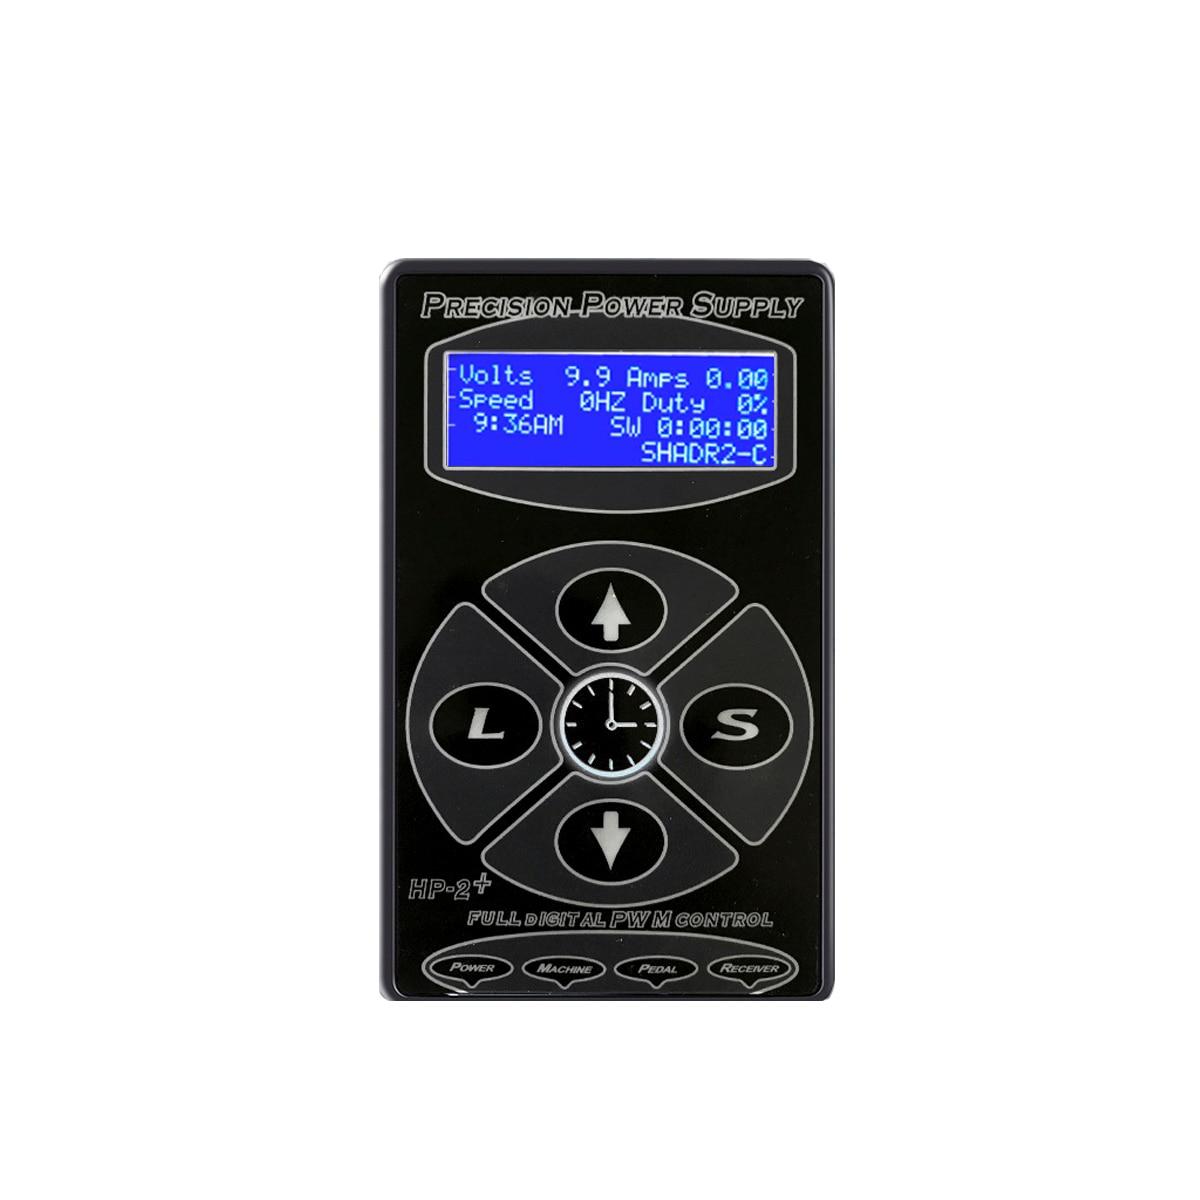 HP-2 fuente de alimentación para tatuaje LCD Digital, máquina de tatuaje giratorio Hurricane, suministros de tatuaje, suministro de energía para maquillaje para tatuaje permanente